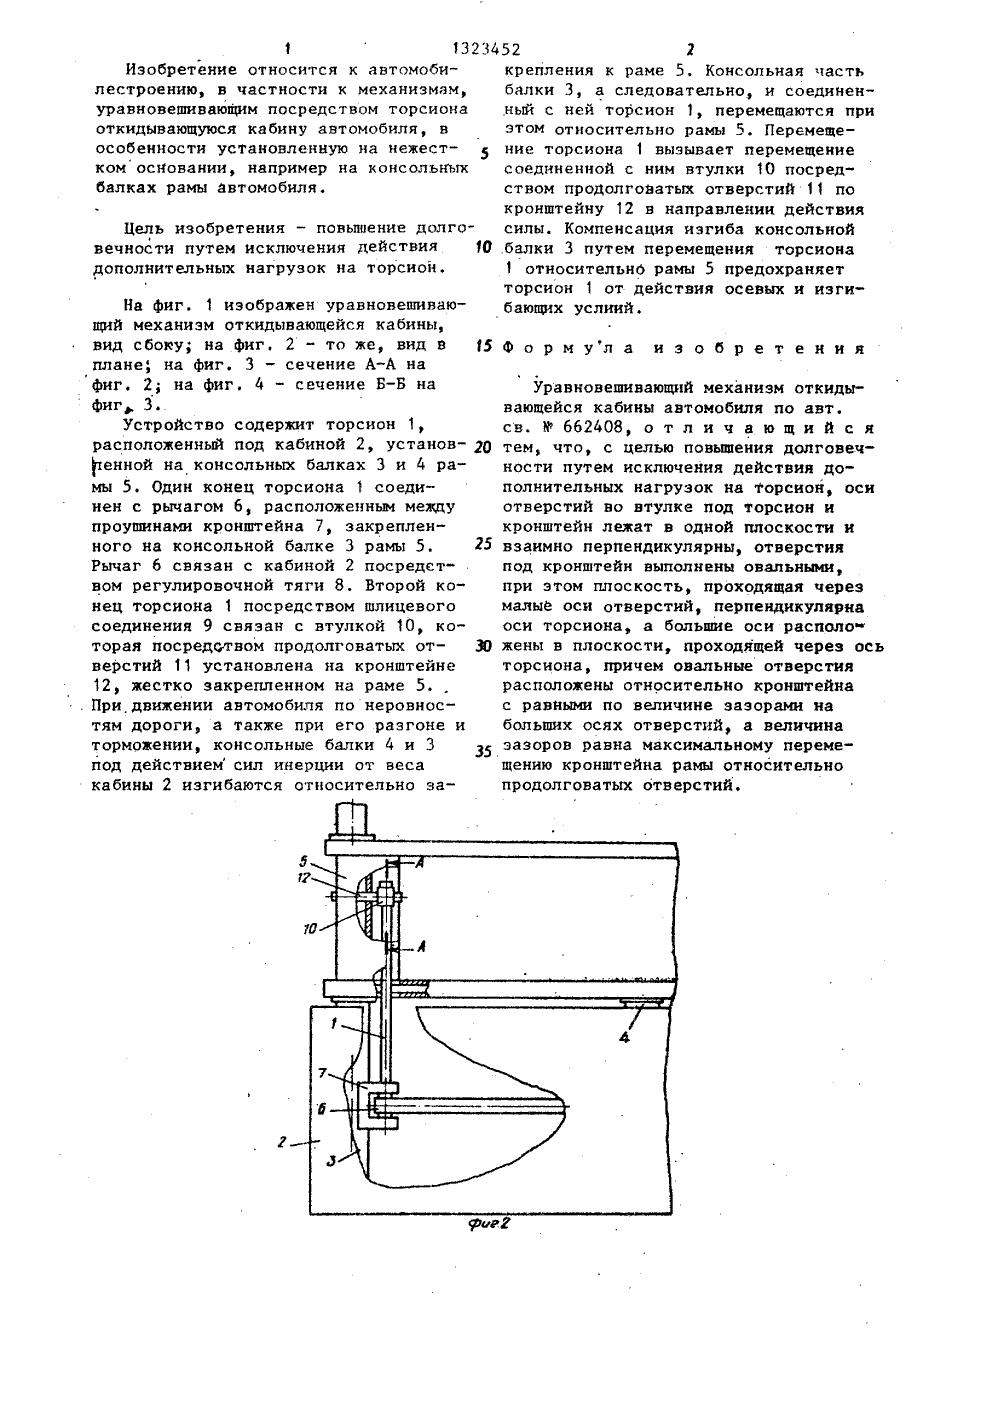 torsion-goliy-mehanizma-uravnoveshivaniya-kabini